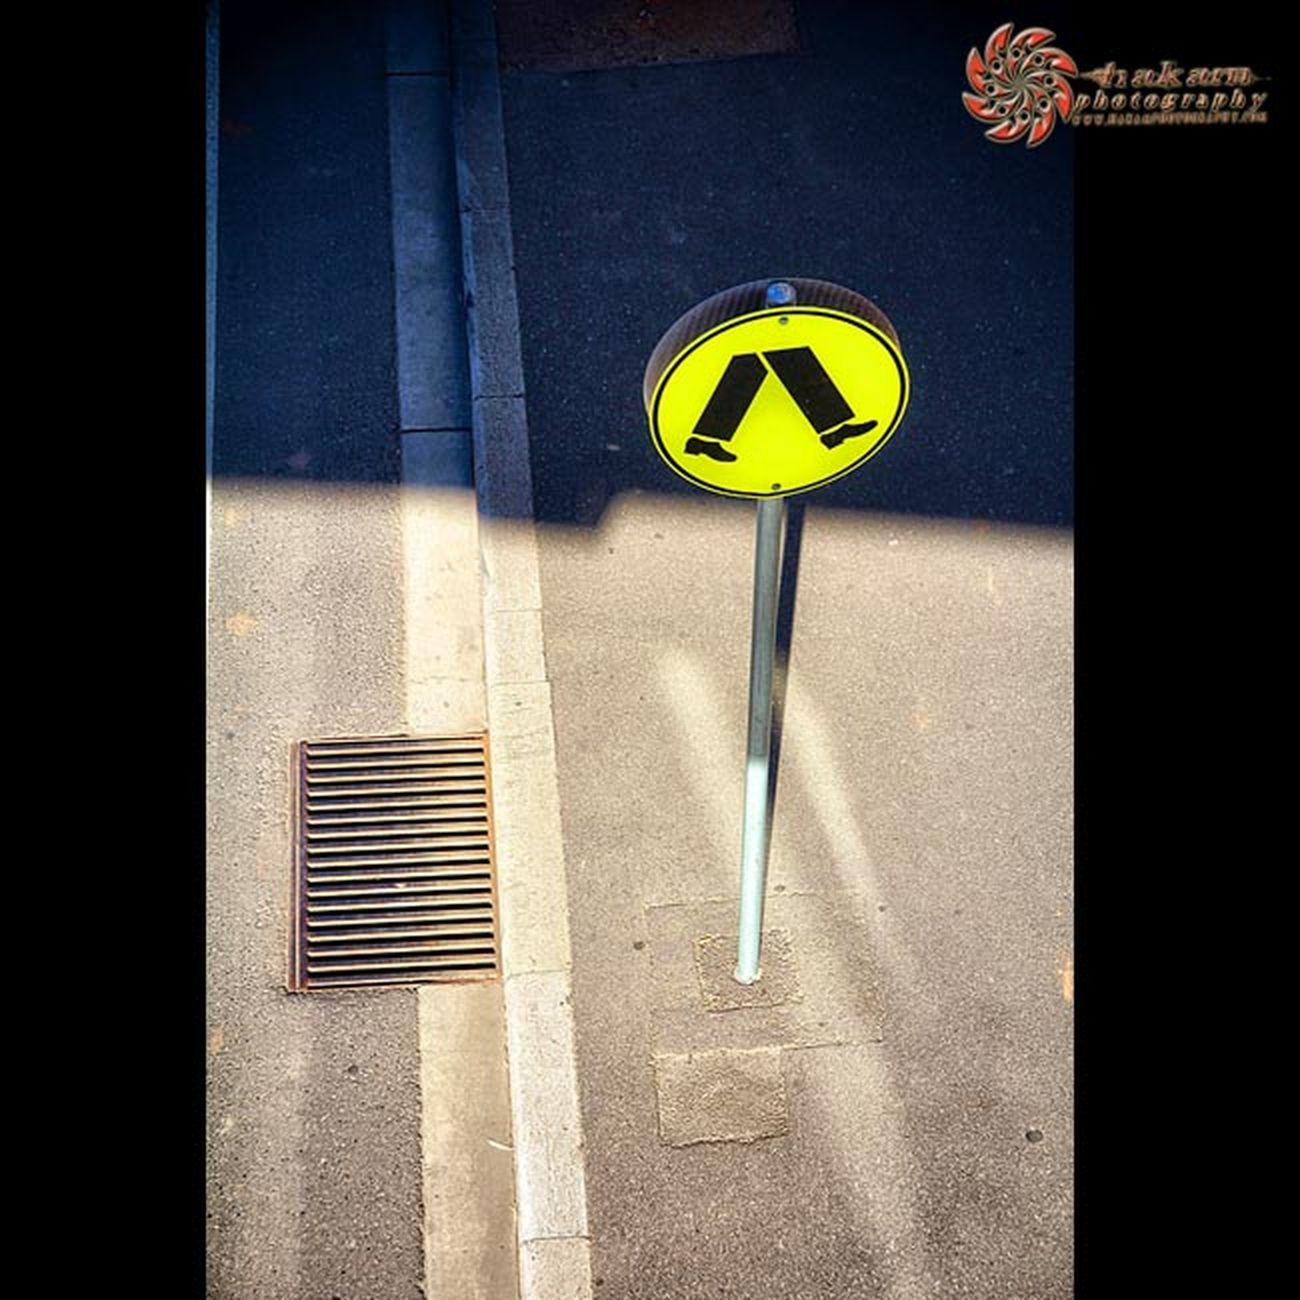 #melbourne #australia #harbourtown #travel #vacation #photography #streetphotpgraphy Streetphotography Melbourne City Travel